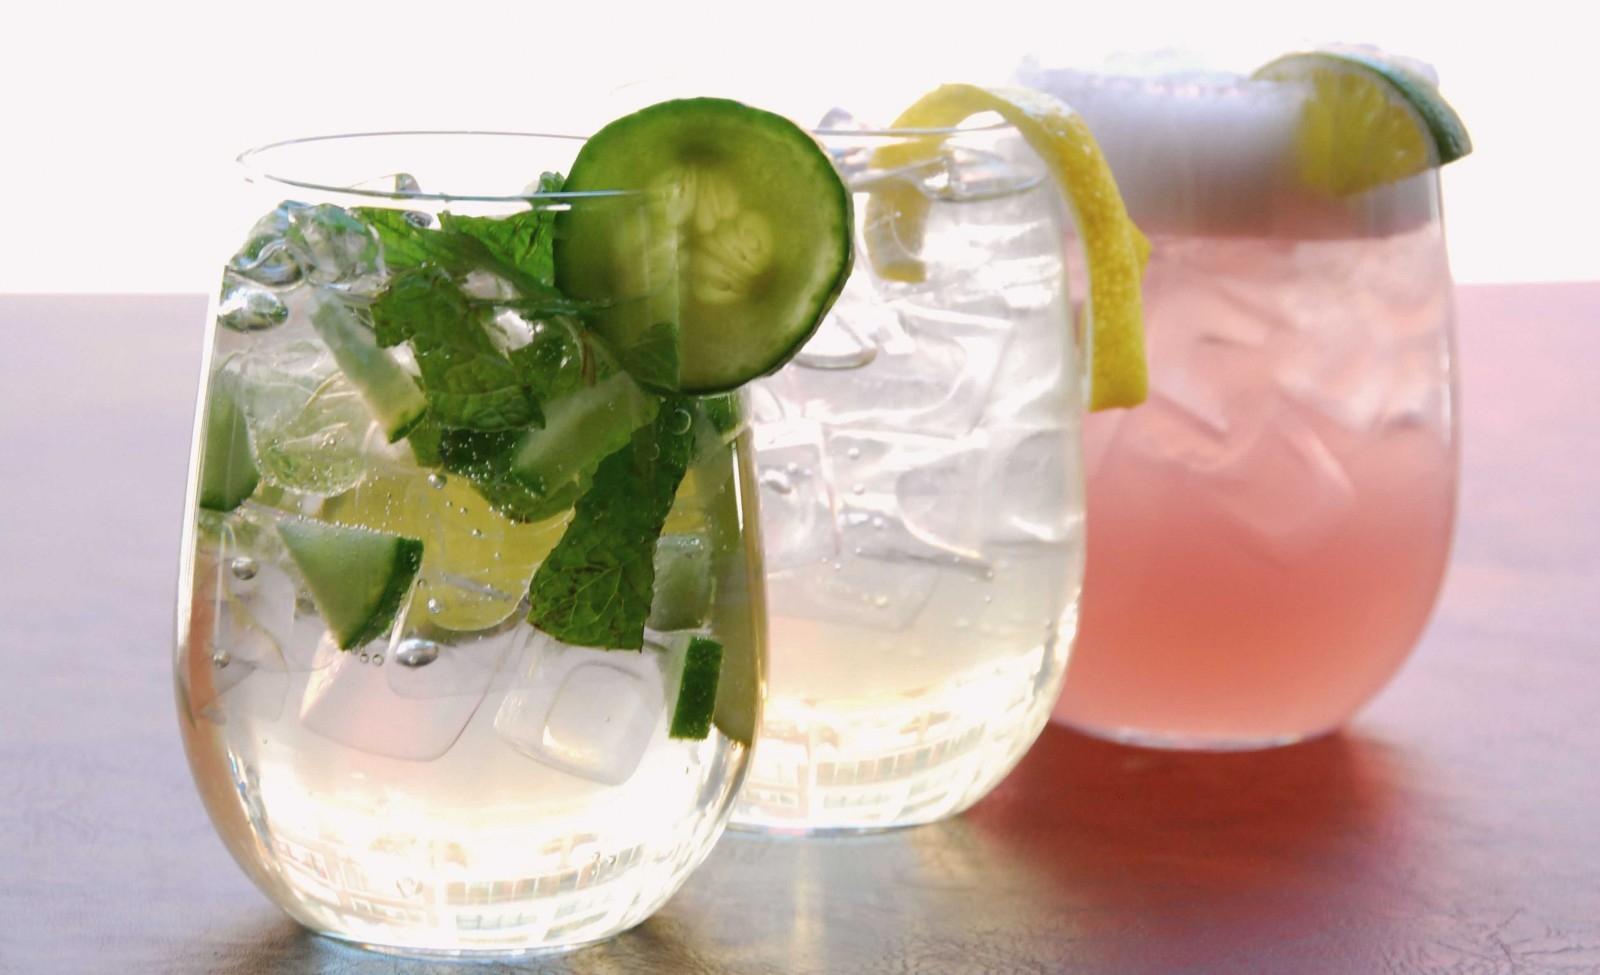 Flavoured tonics - Photo: Flickr/ laquenellenyc